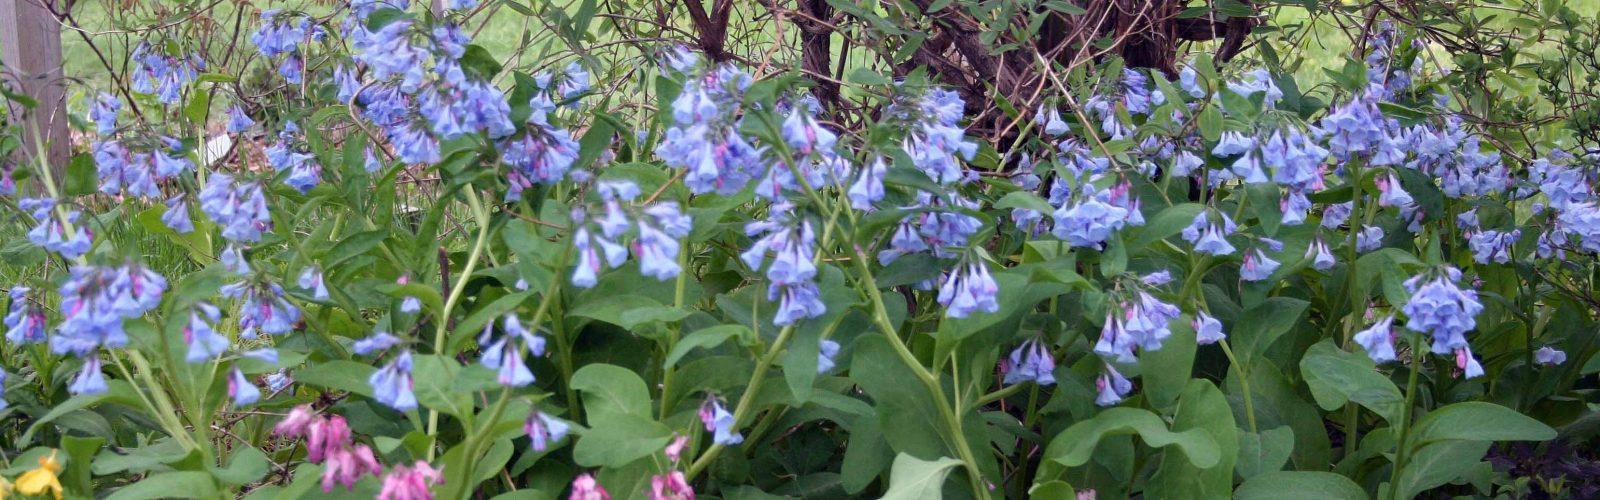 Thinking of Spring: The Spring Ephemerals